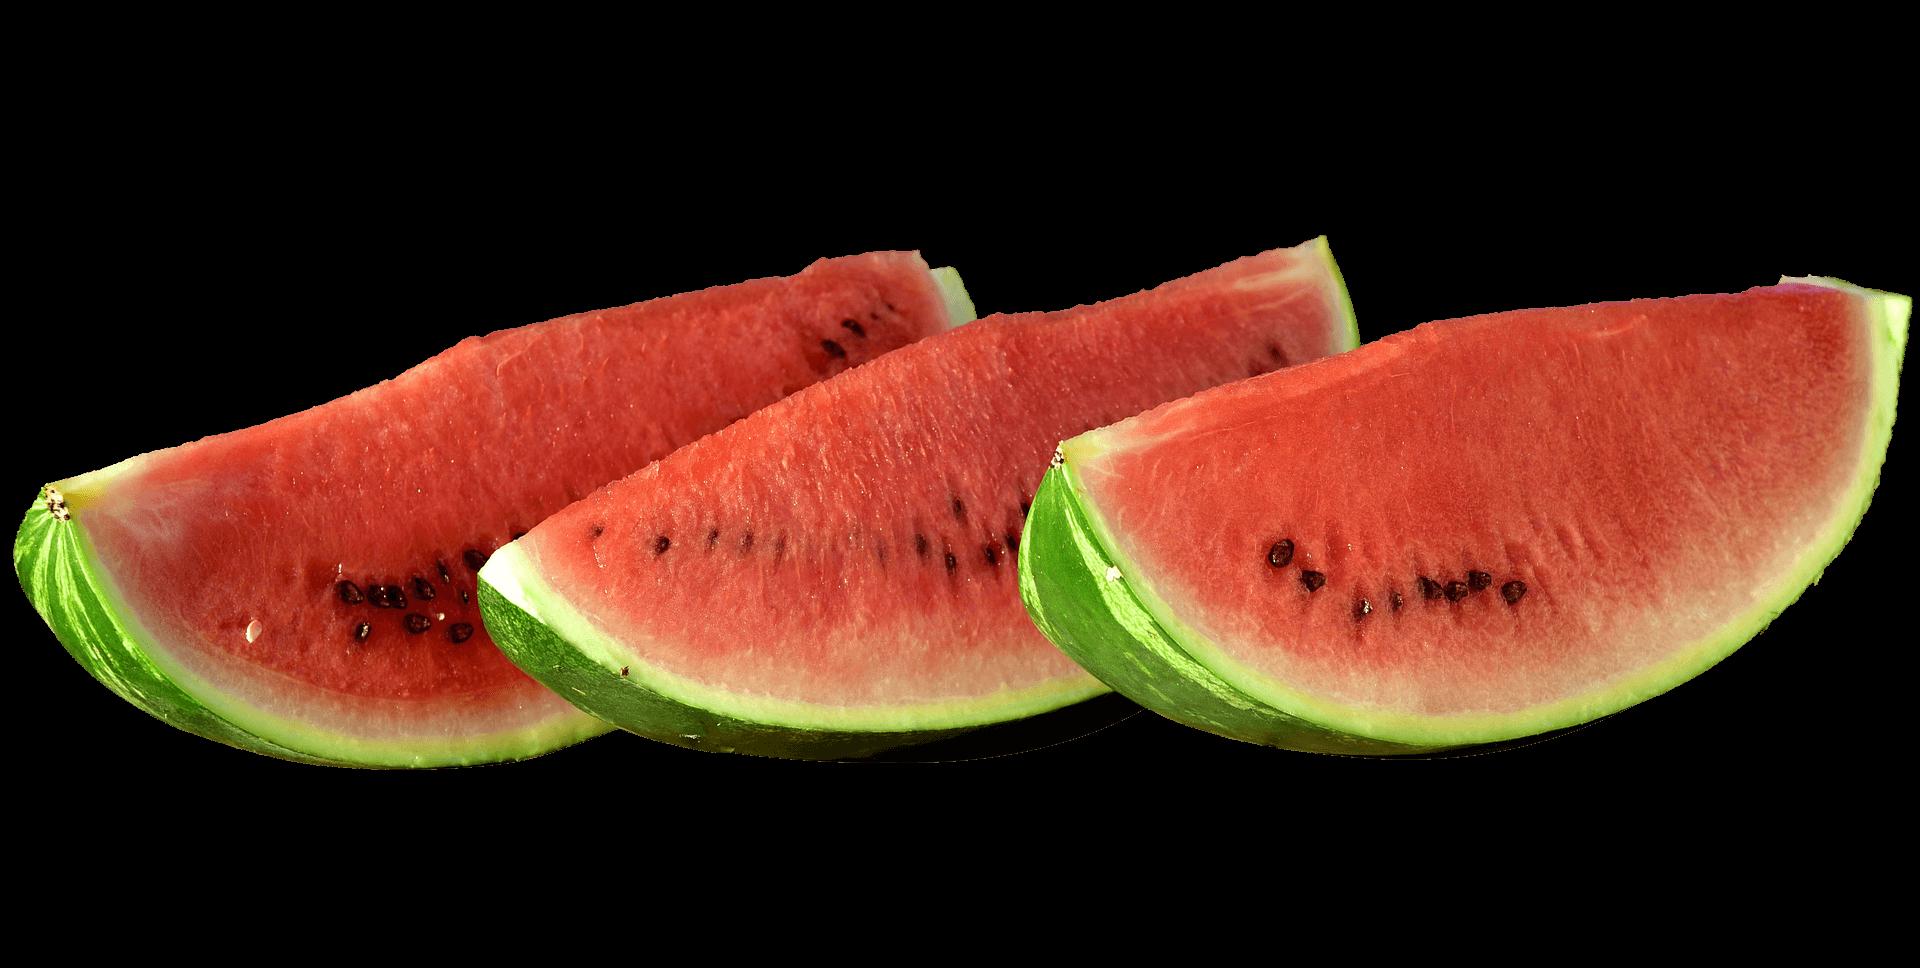 watermelon-5735979_1920 (1)